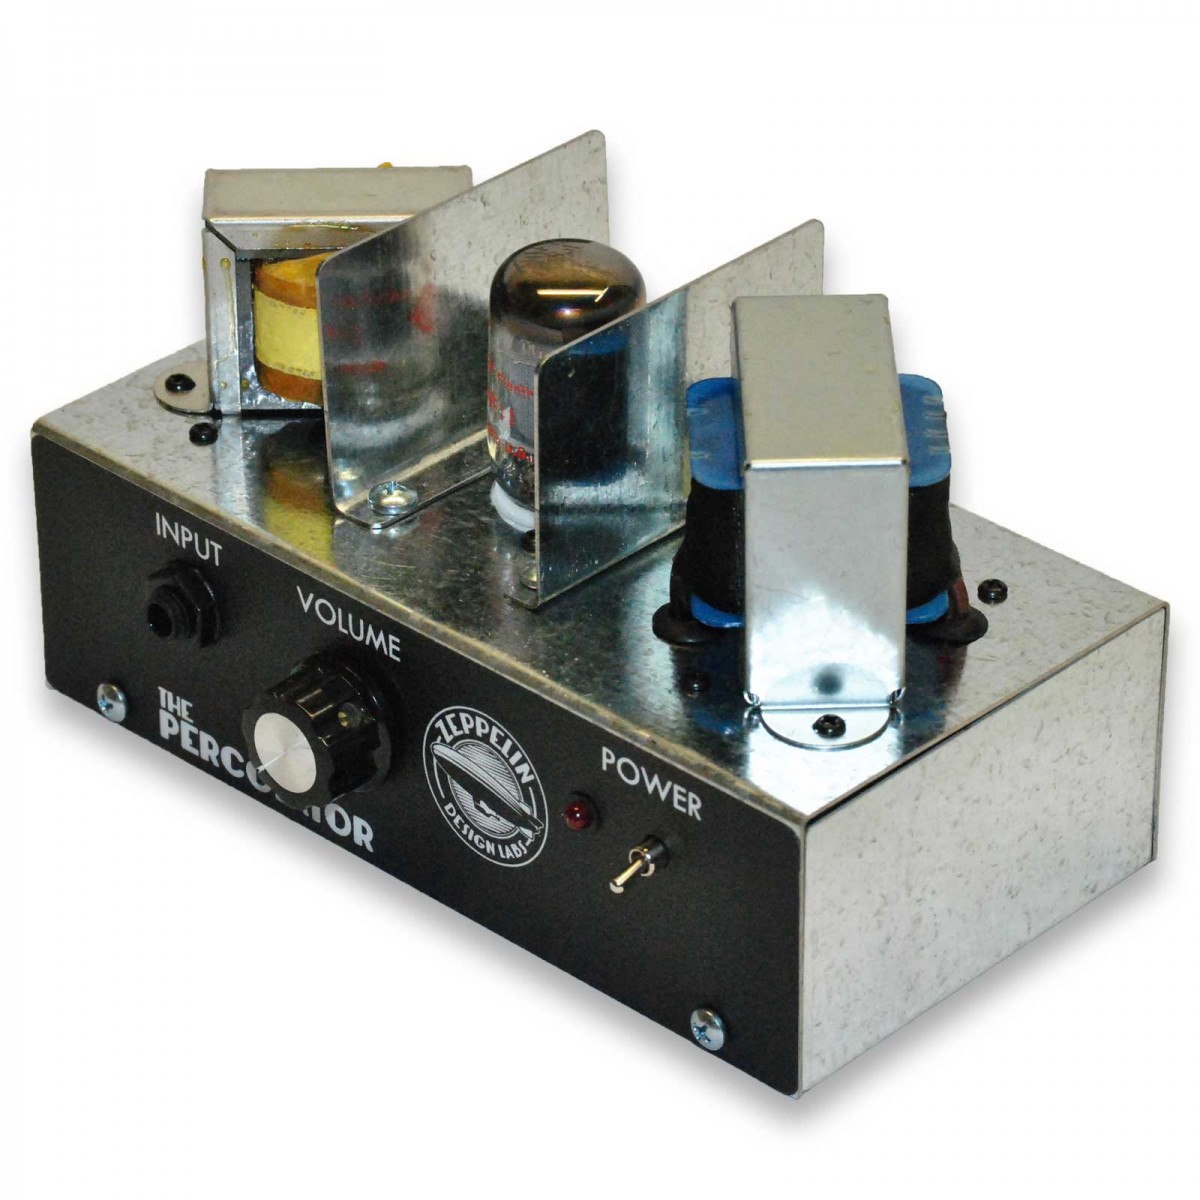 percolator 2w tube guitar amp valve amp zeppelin design labs. Black Bedroom Furniture Sets. Home Design Ideas